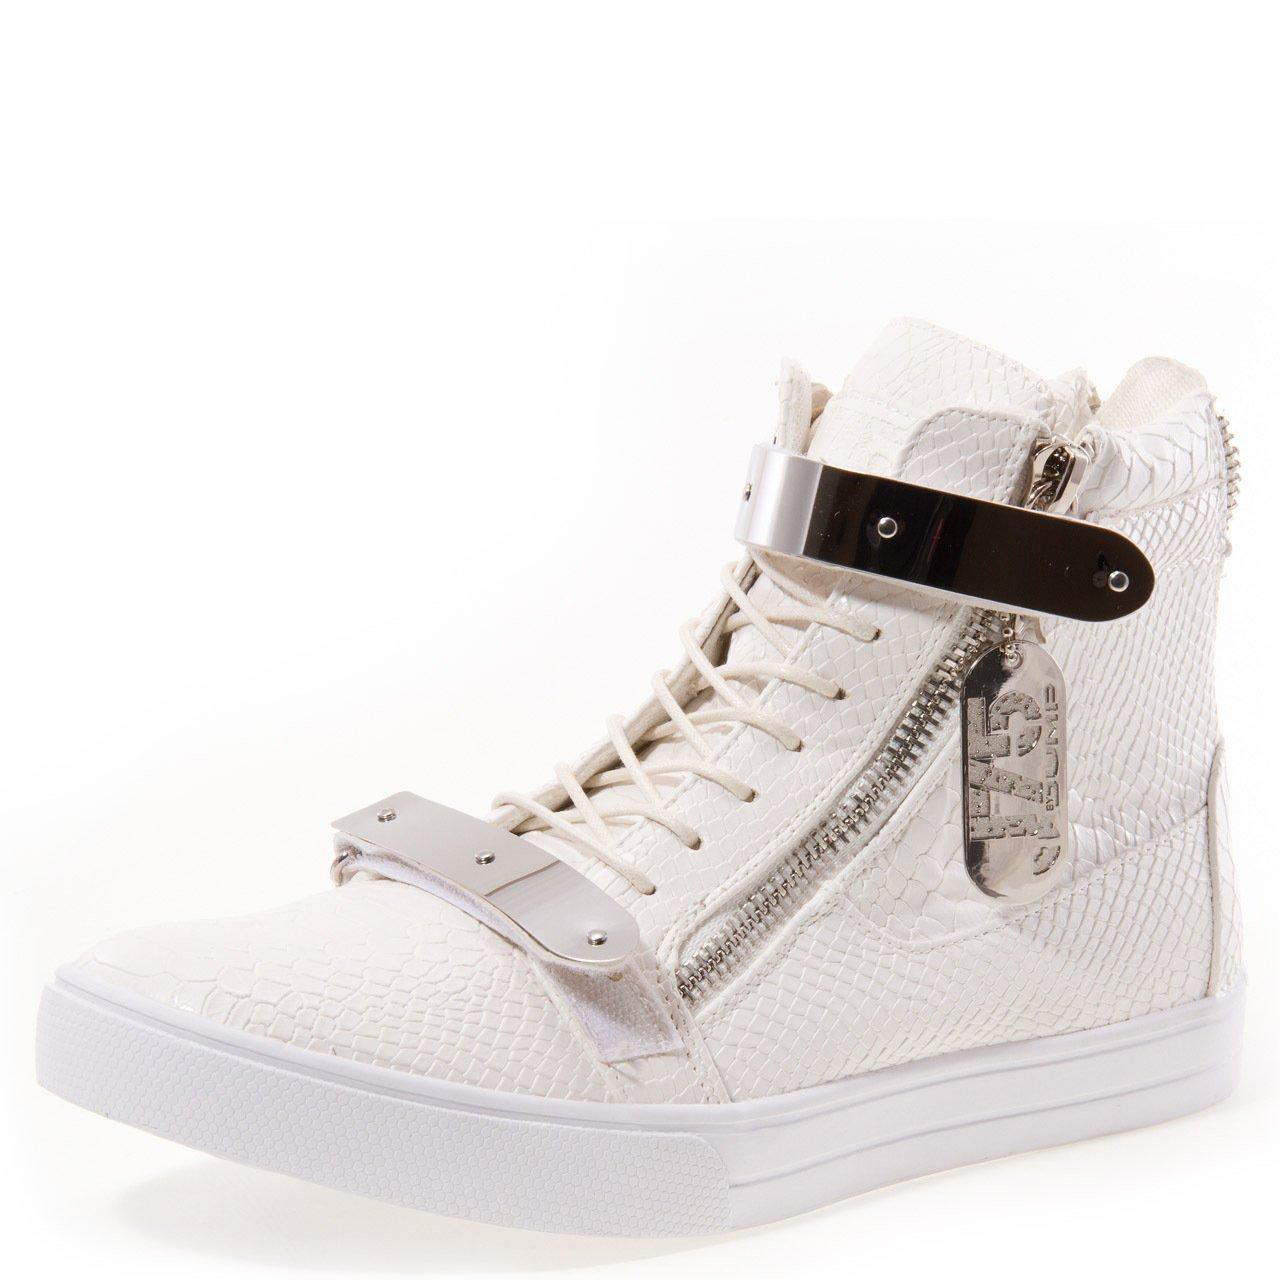 J75 by Jump Men's Zion High-Top Sneaker Navy Silver